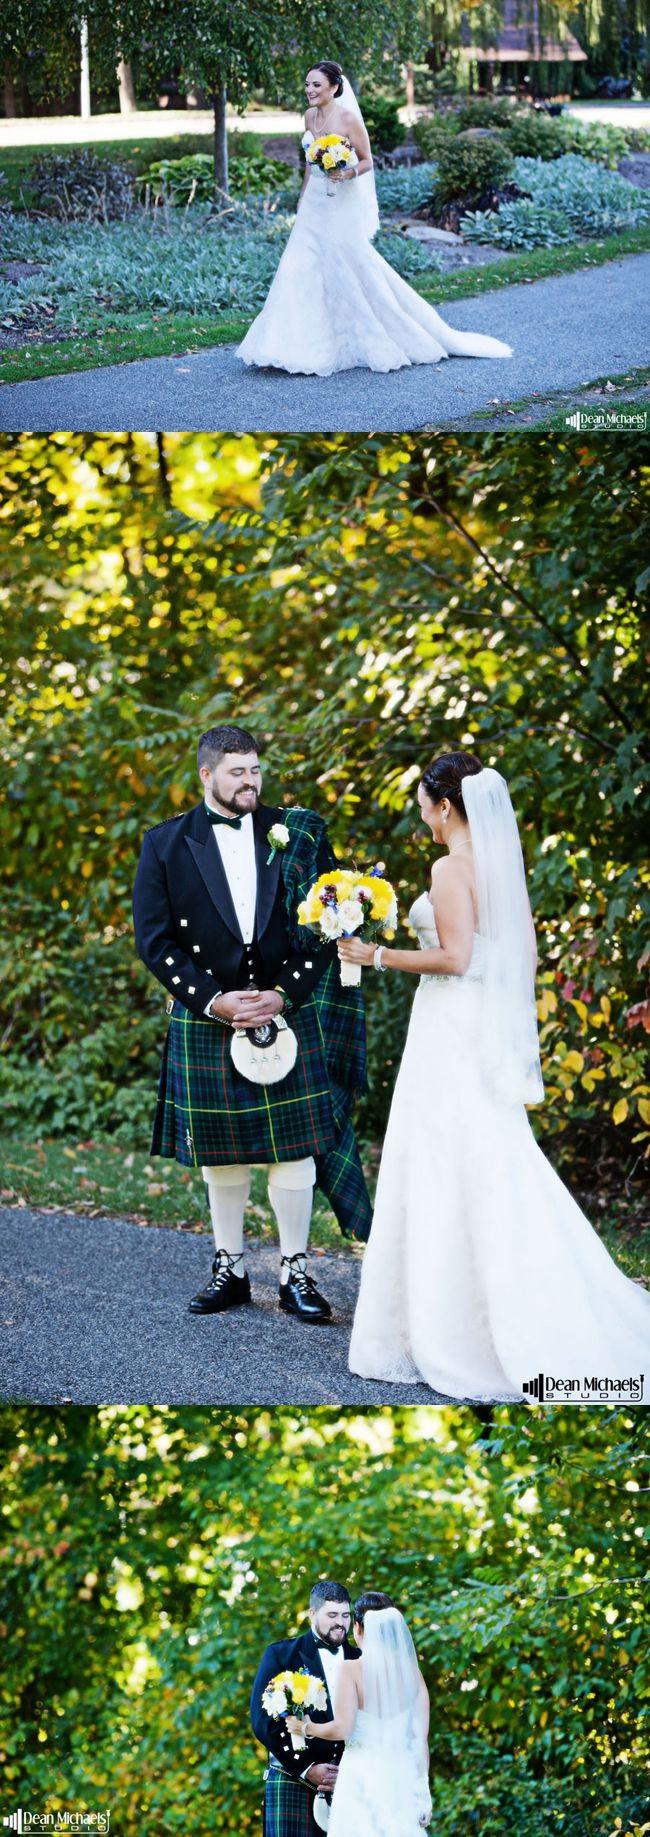 Laura Ryan S October 2017 Wedding At The Minerals Resort Spa